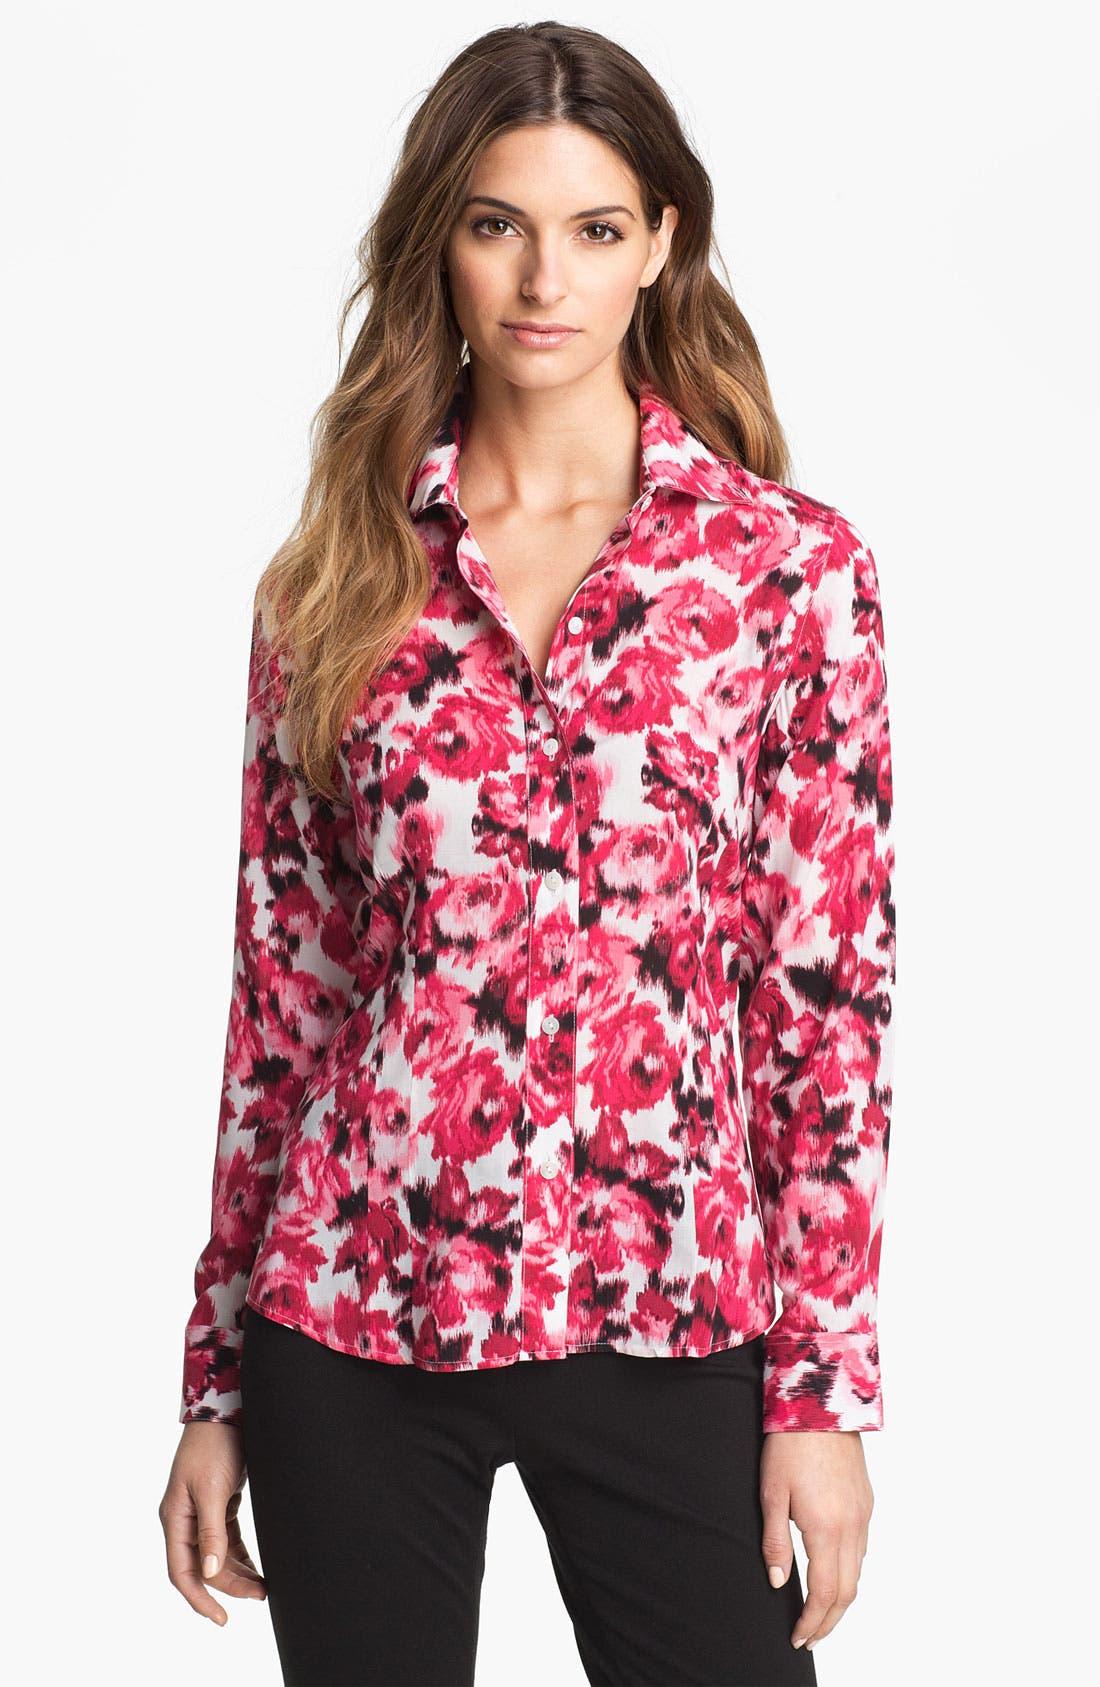 Alternate Image 1 Selected - Foxcroft 'Ikat Rose' Shirt (Petite)